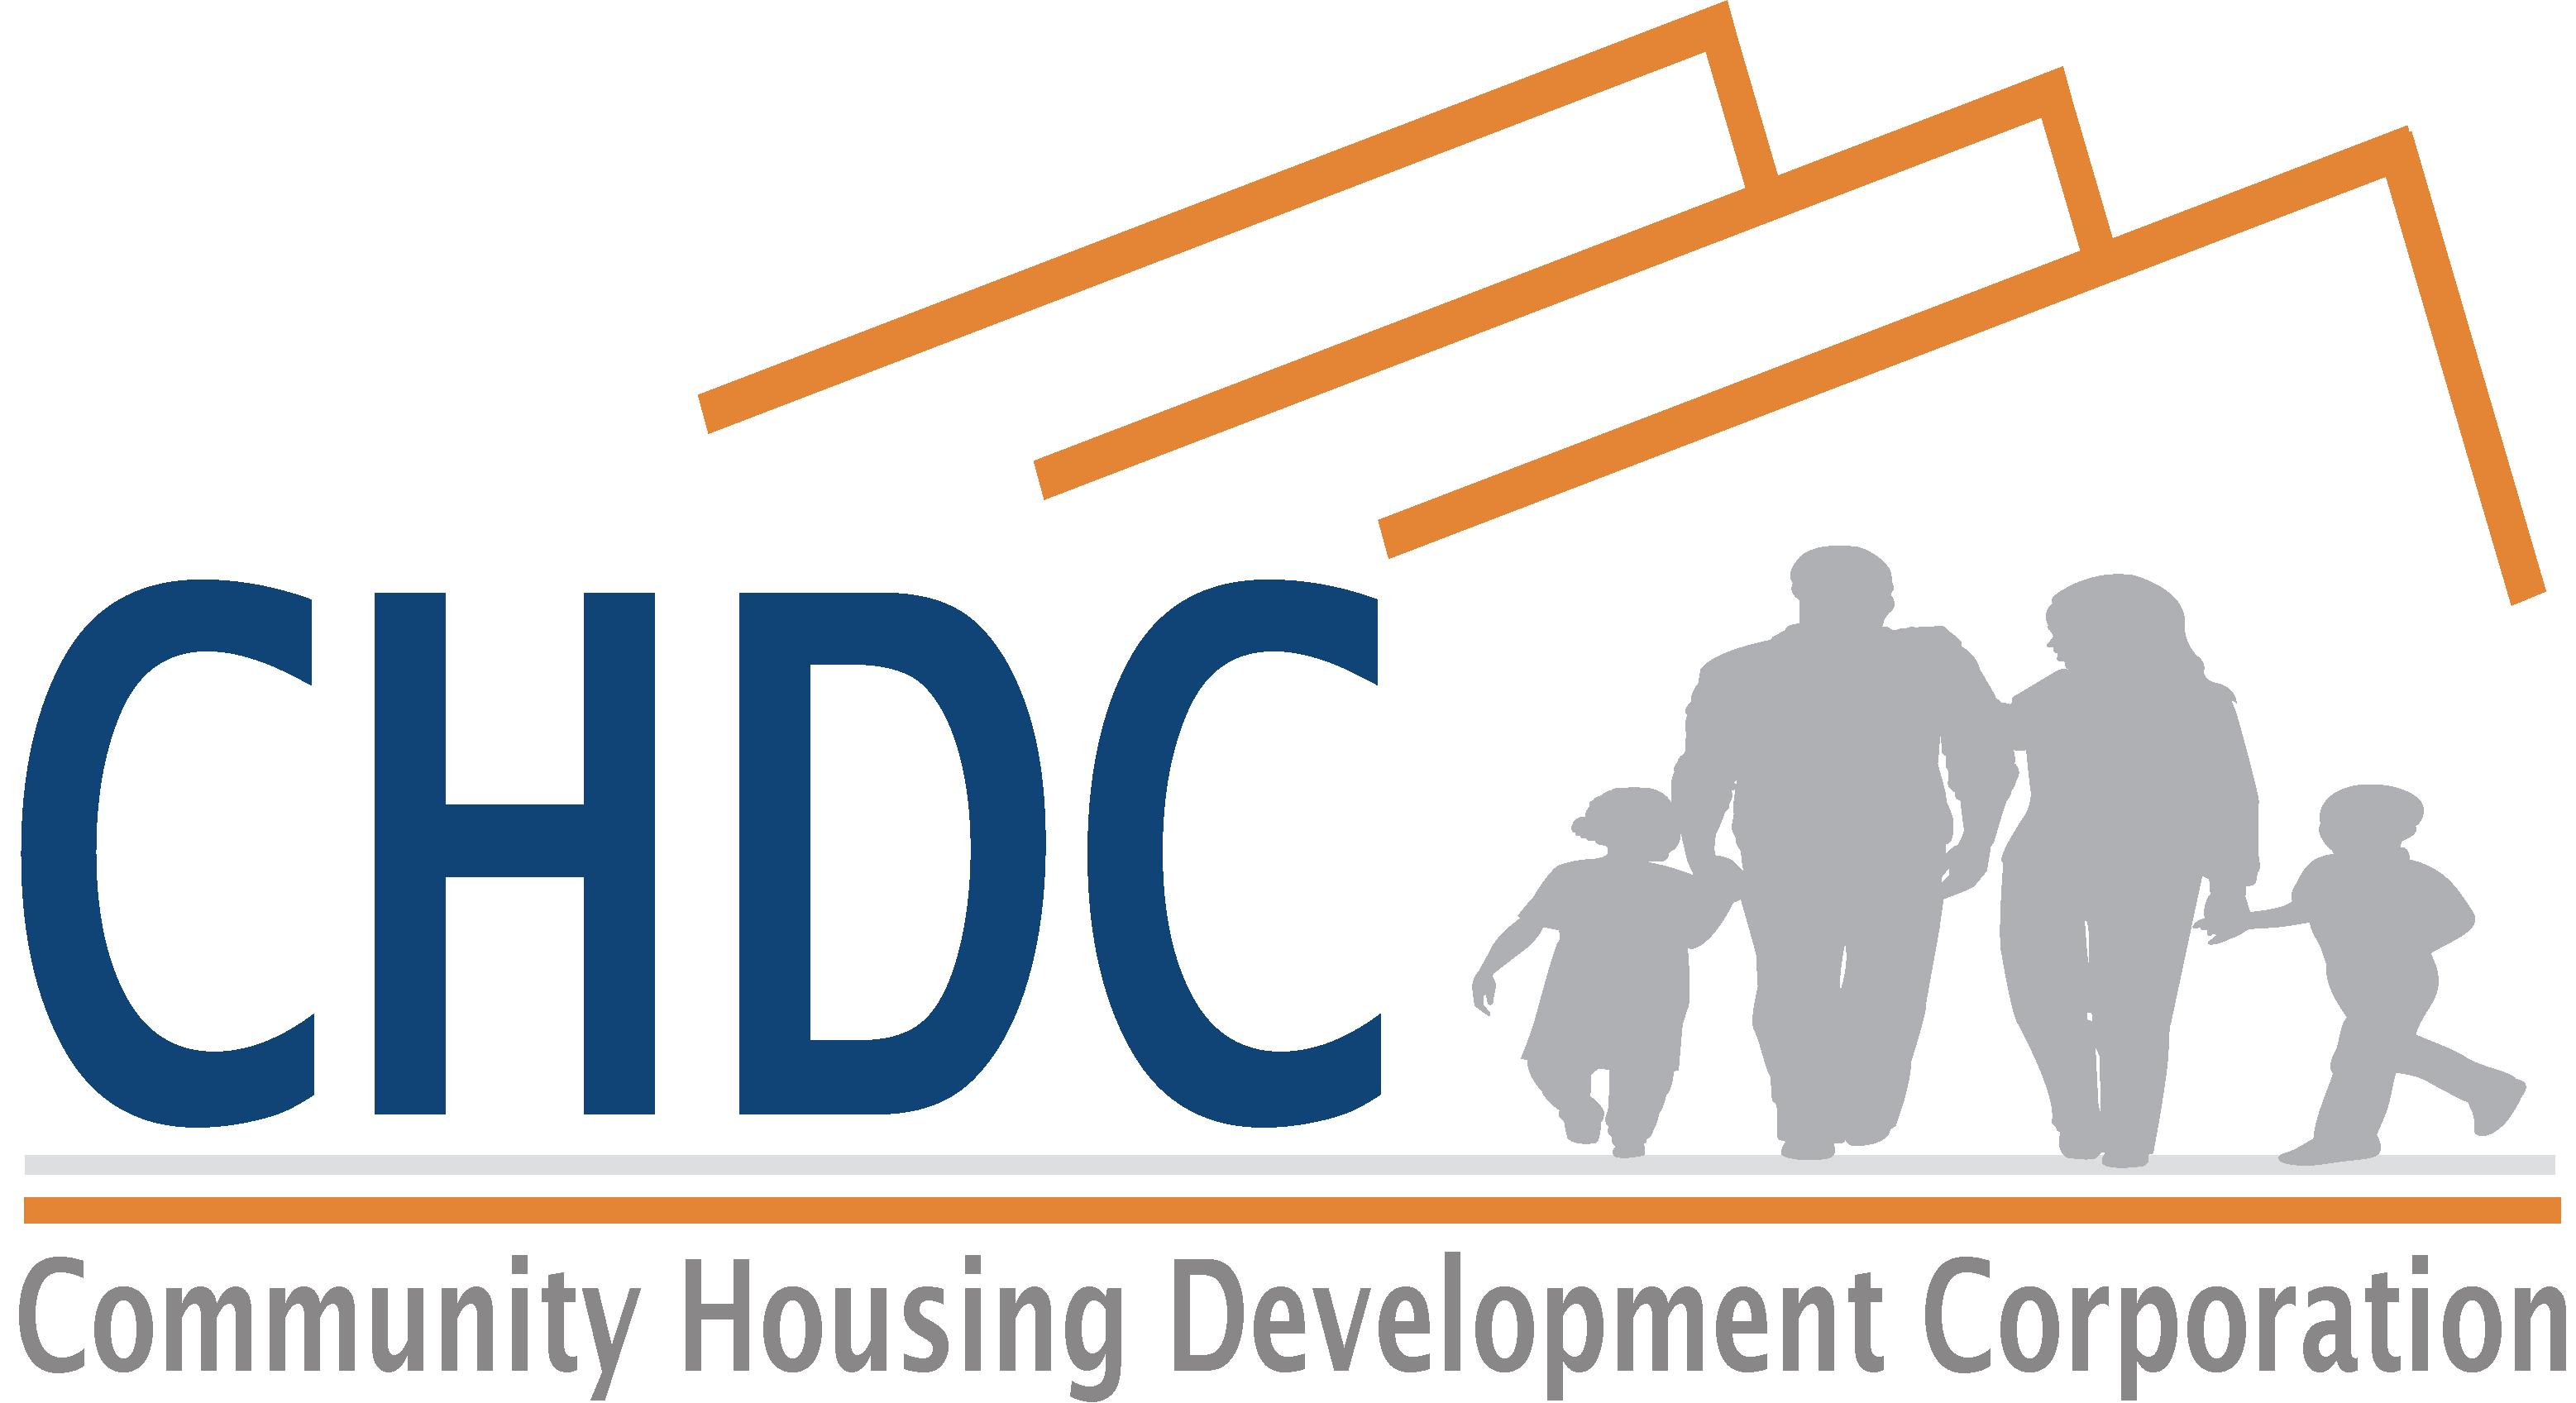 Community Housing Development Corporation